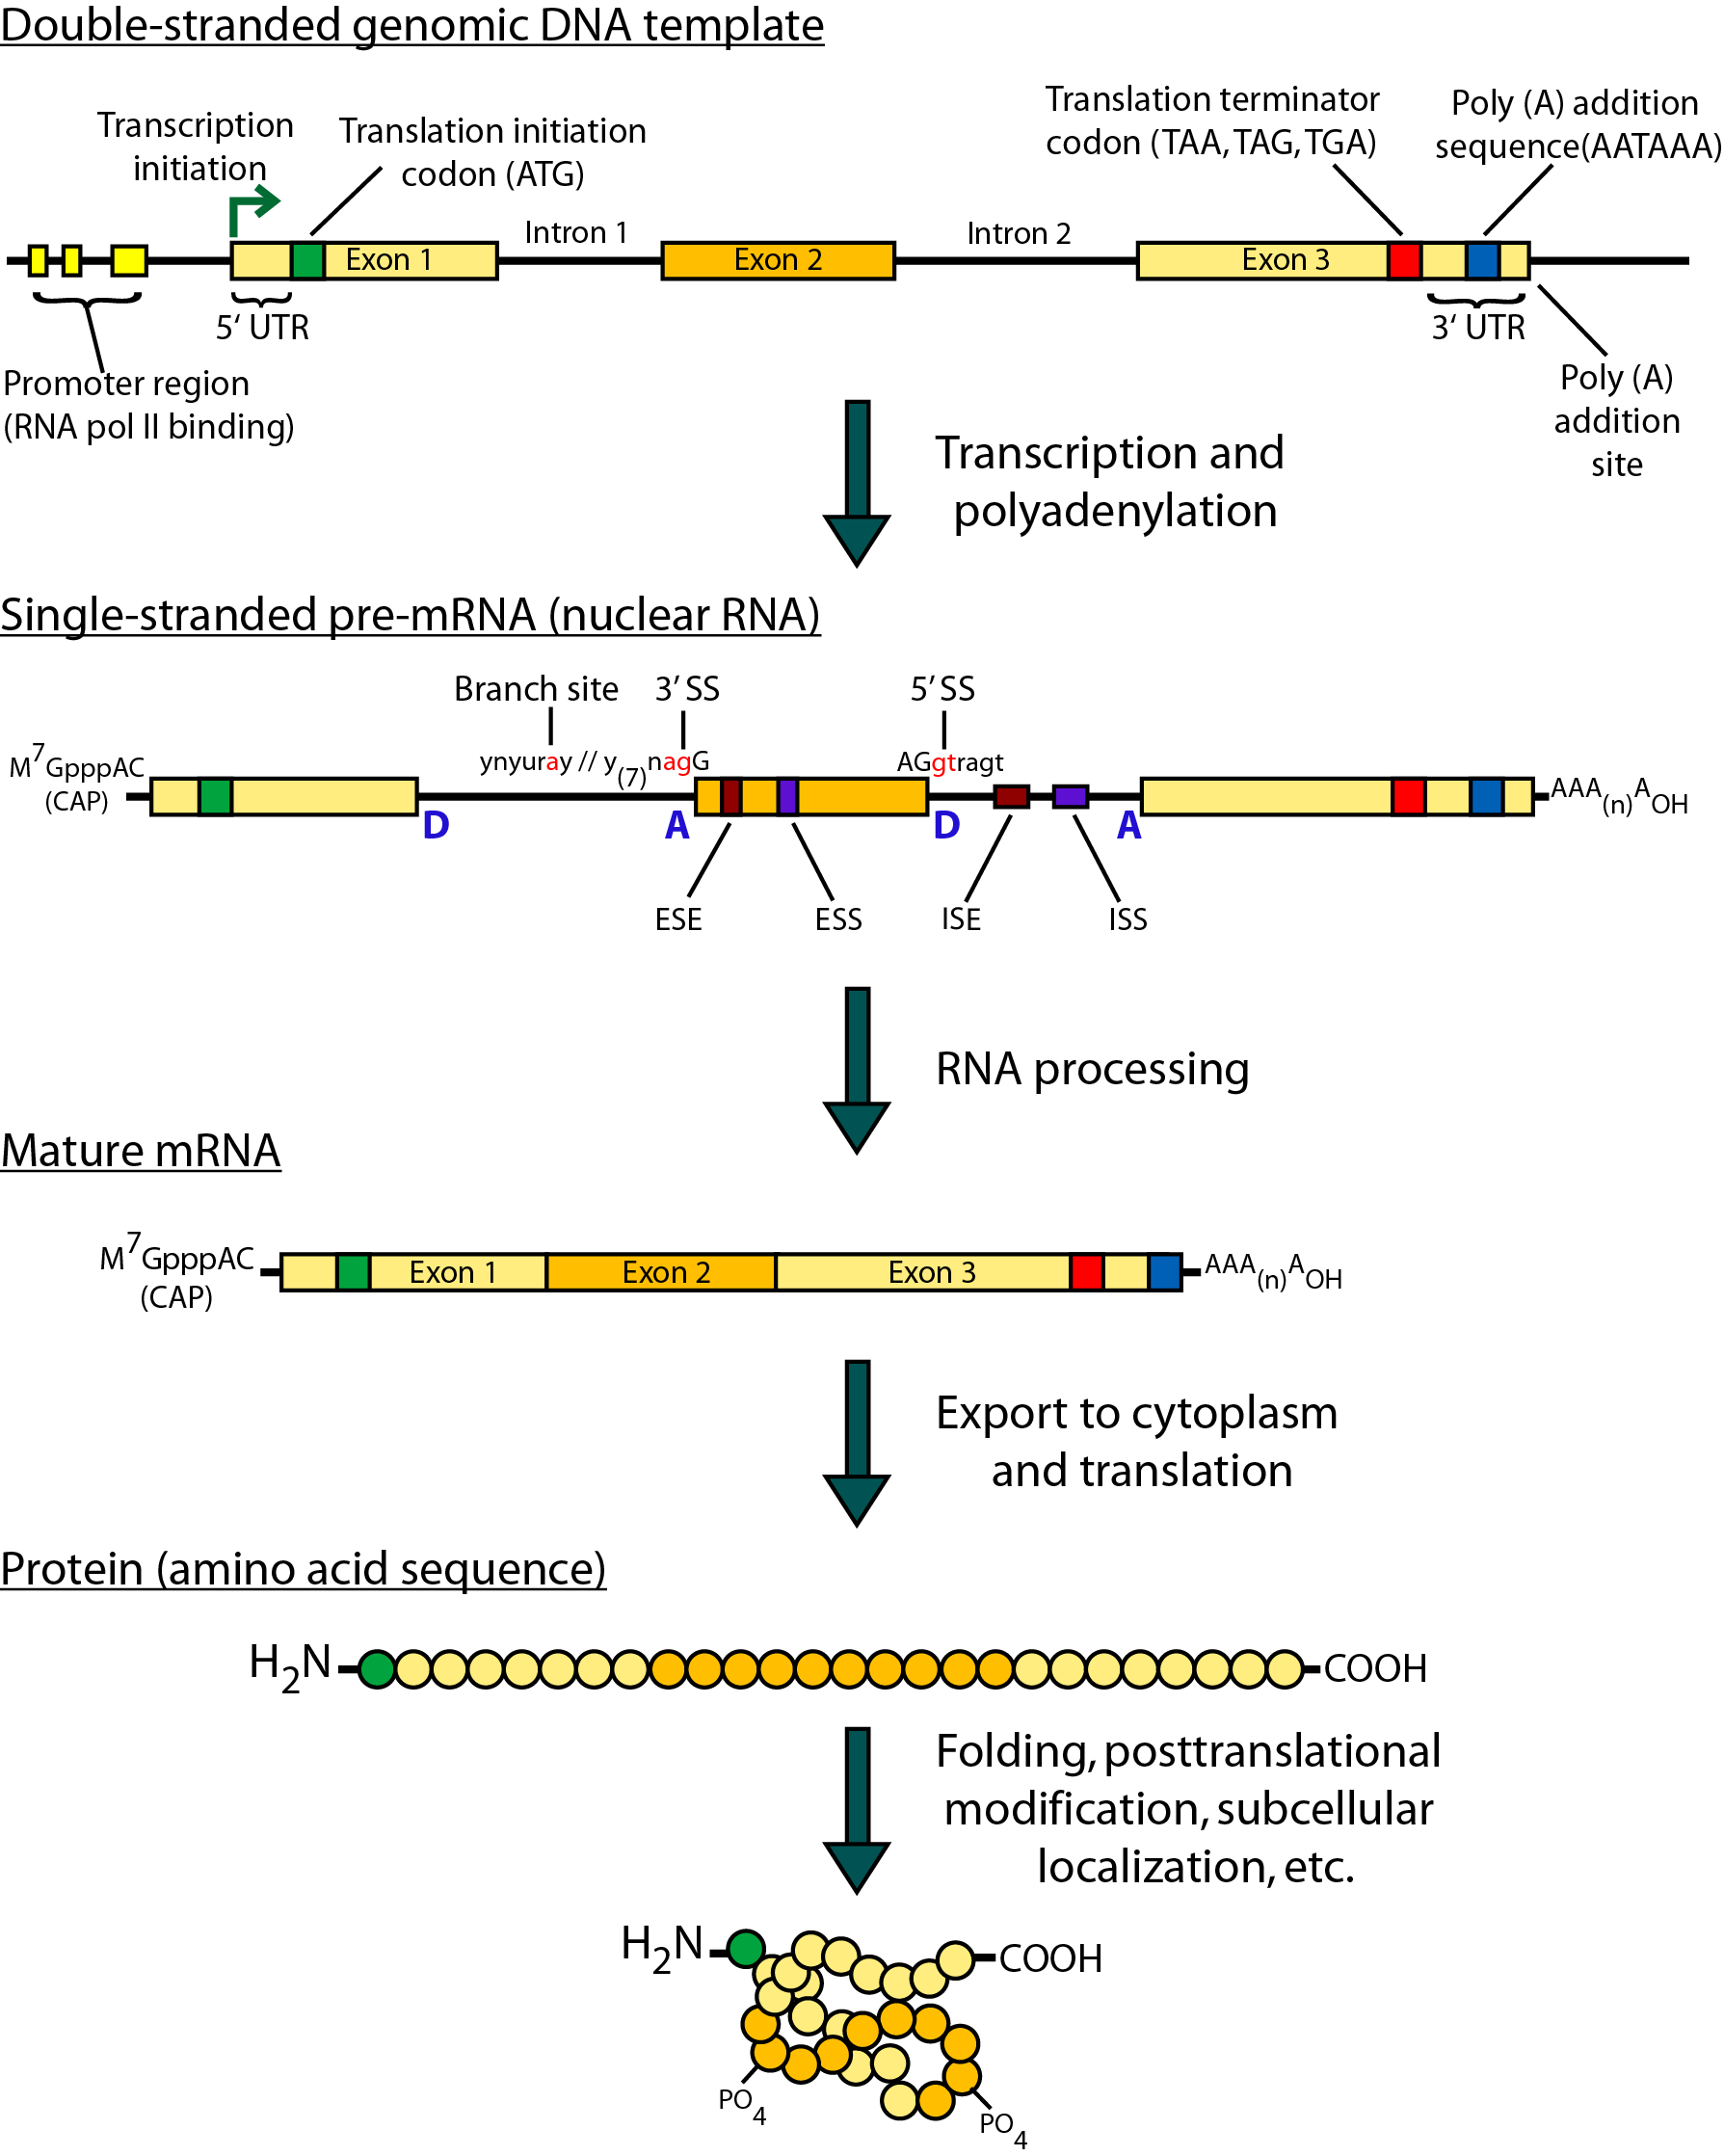 Gene expression diagram